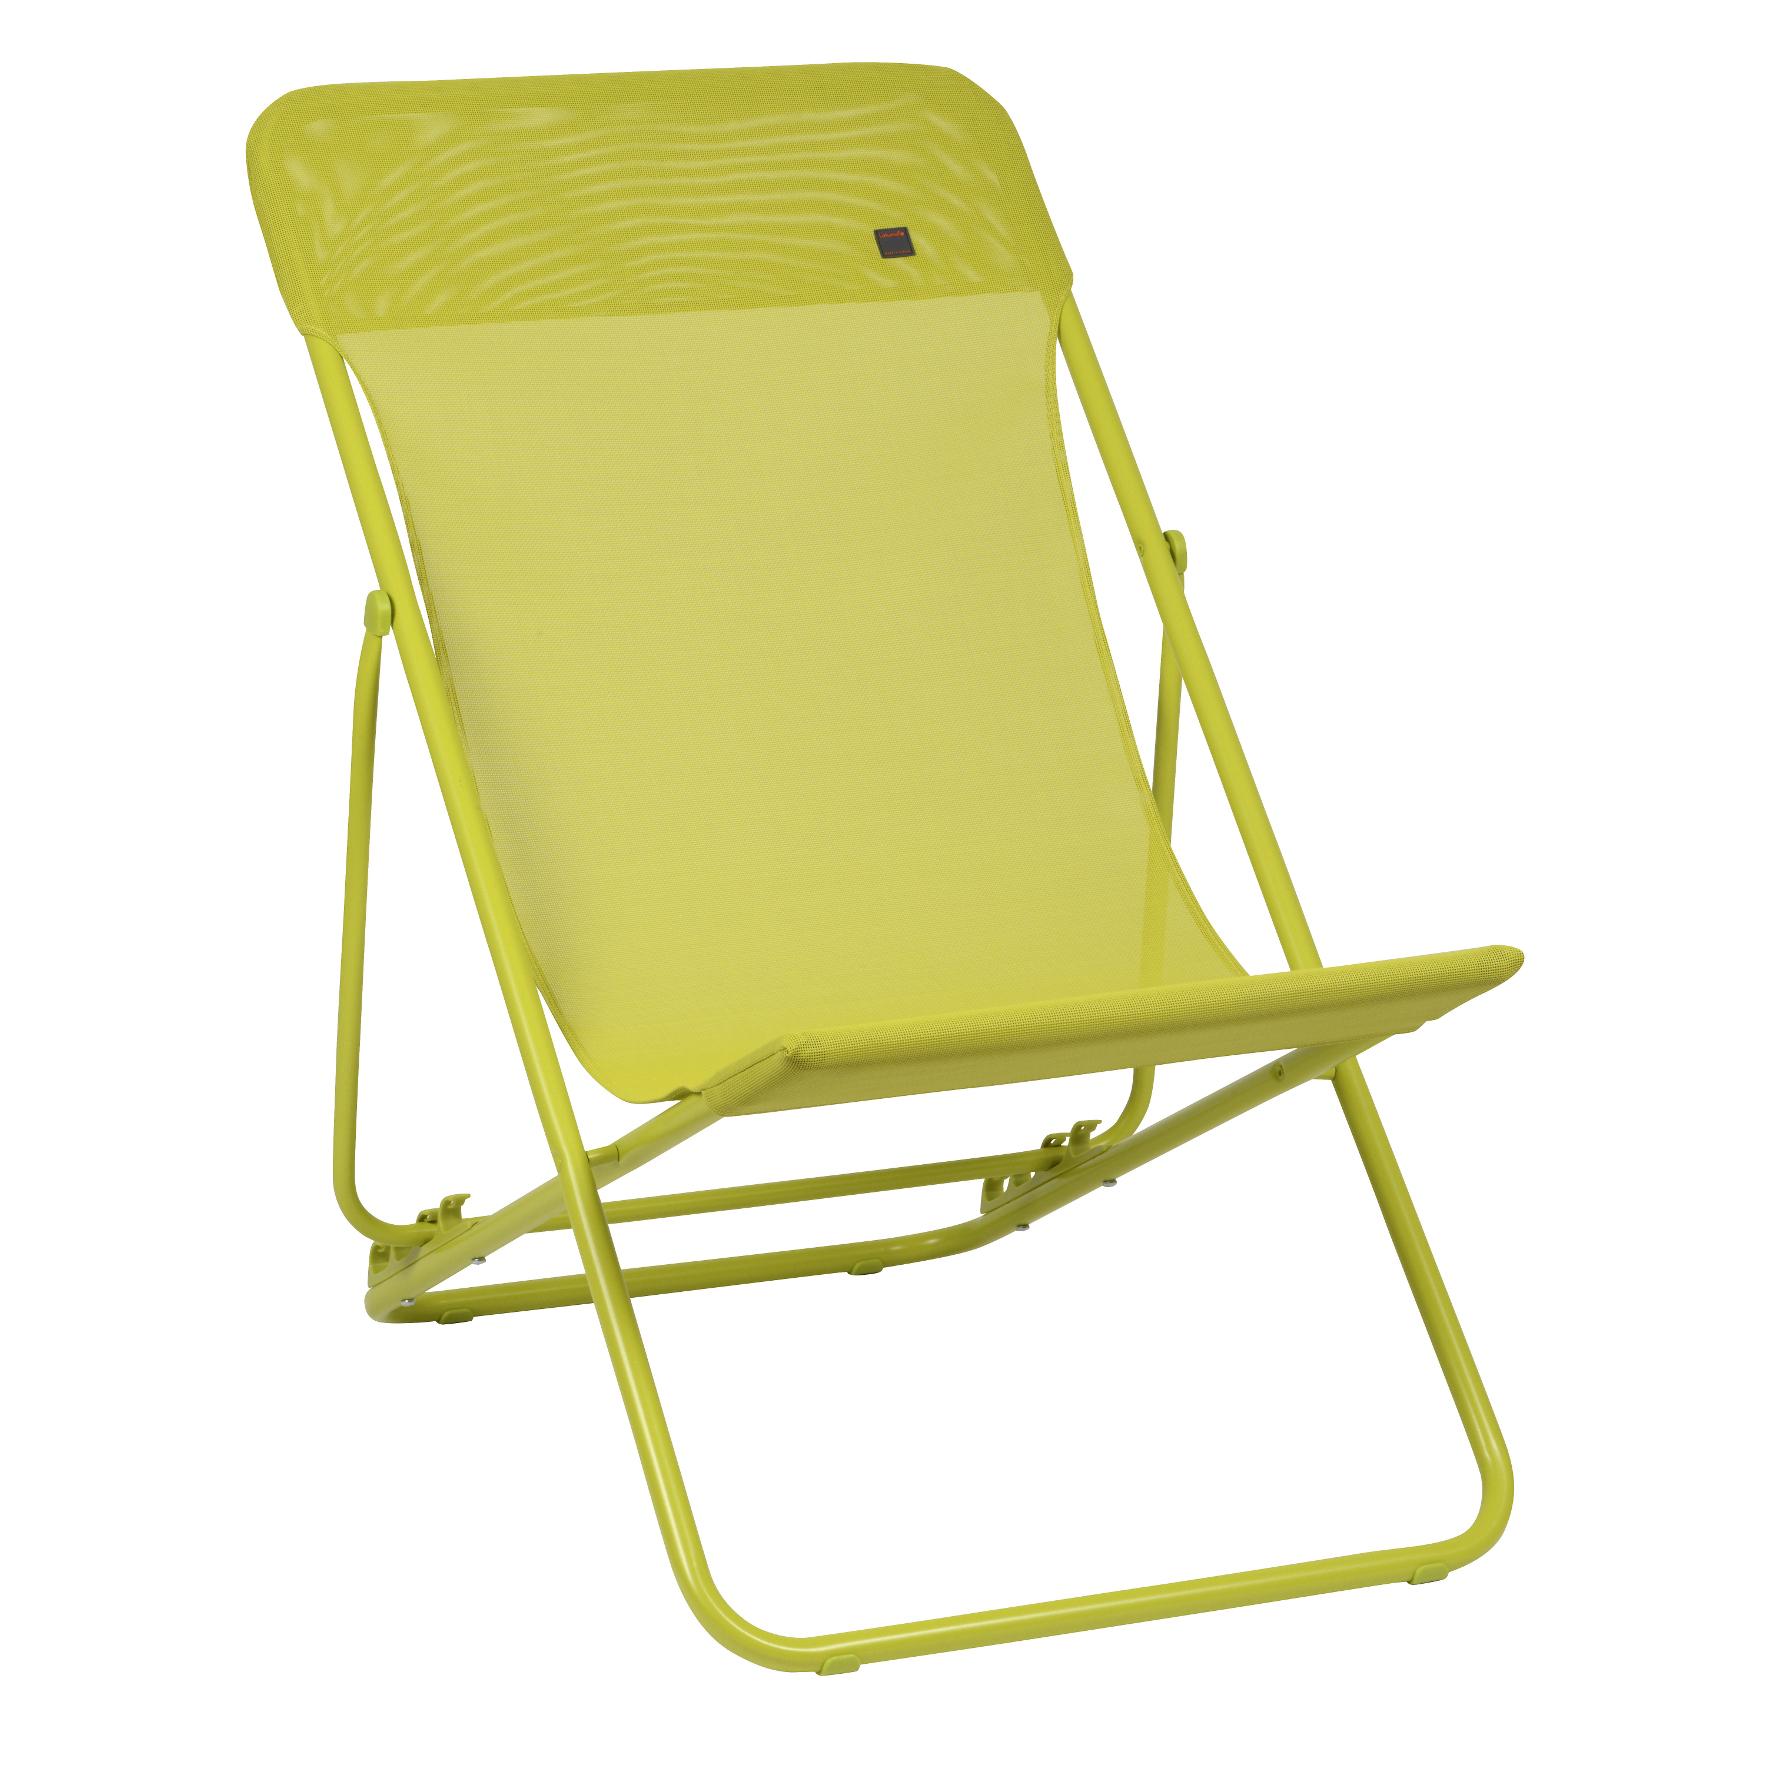 lafuma c maxi transat chaise pliante colorblock batyline. Black Bedroom Furniture Sets. Home Design Ideas